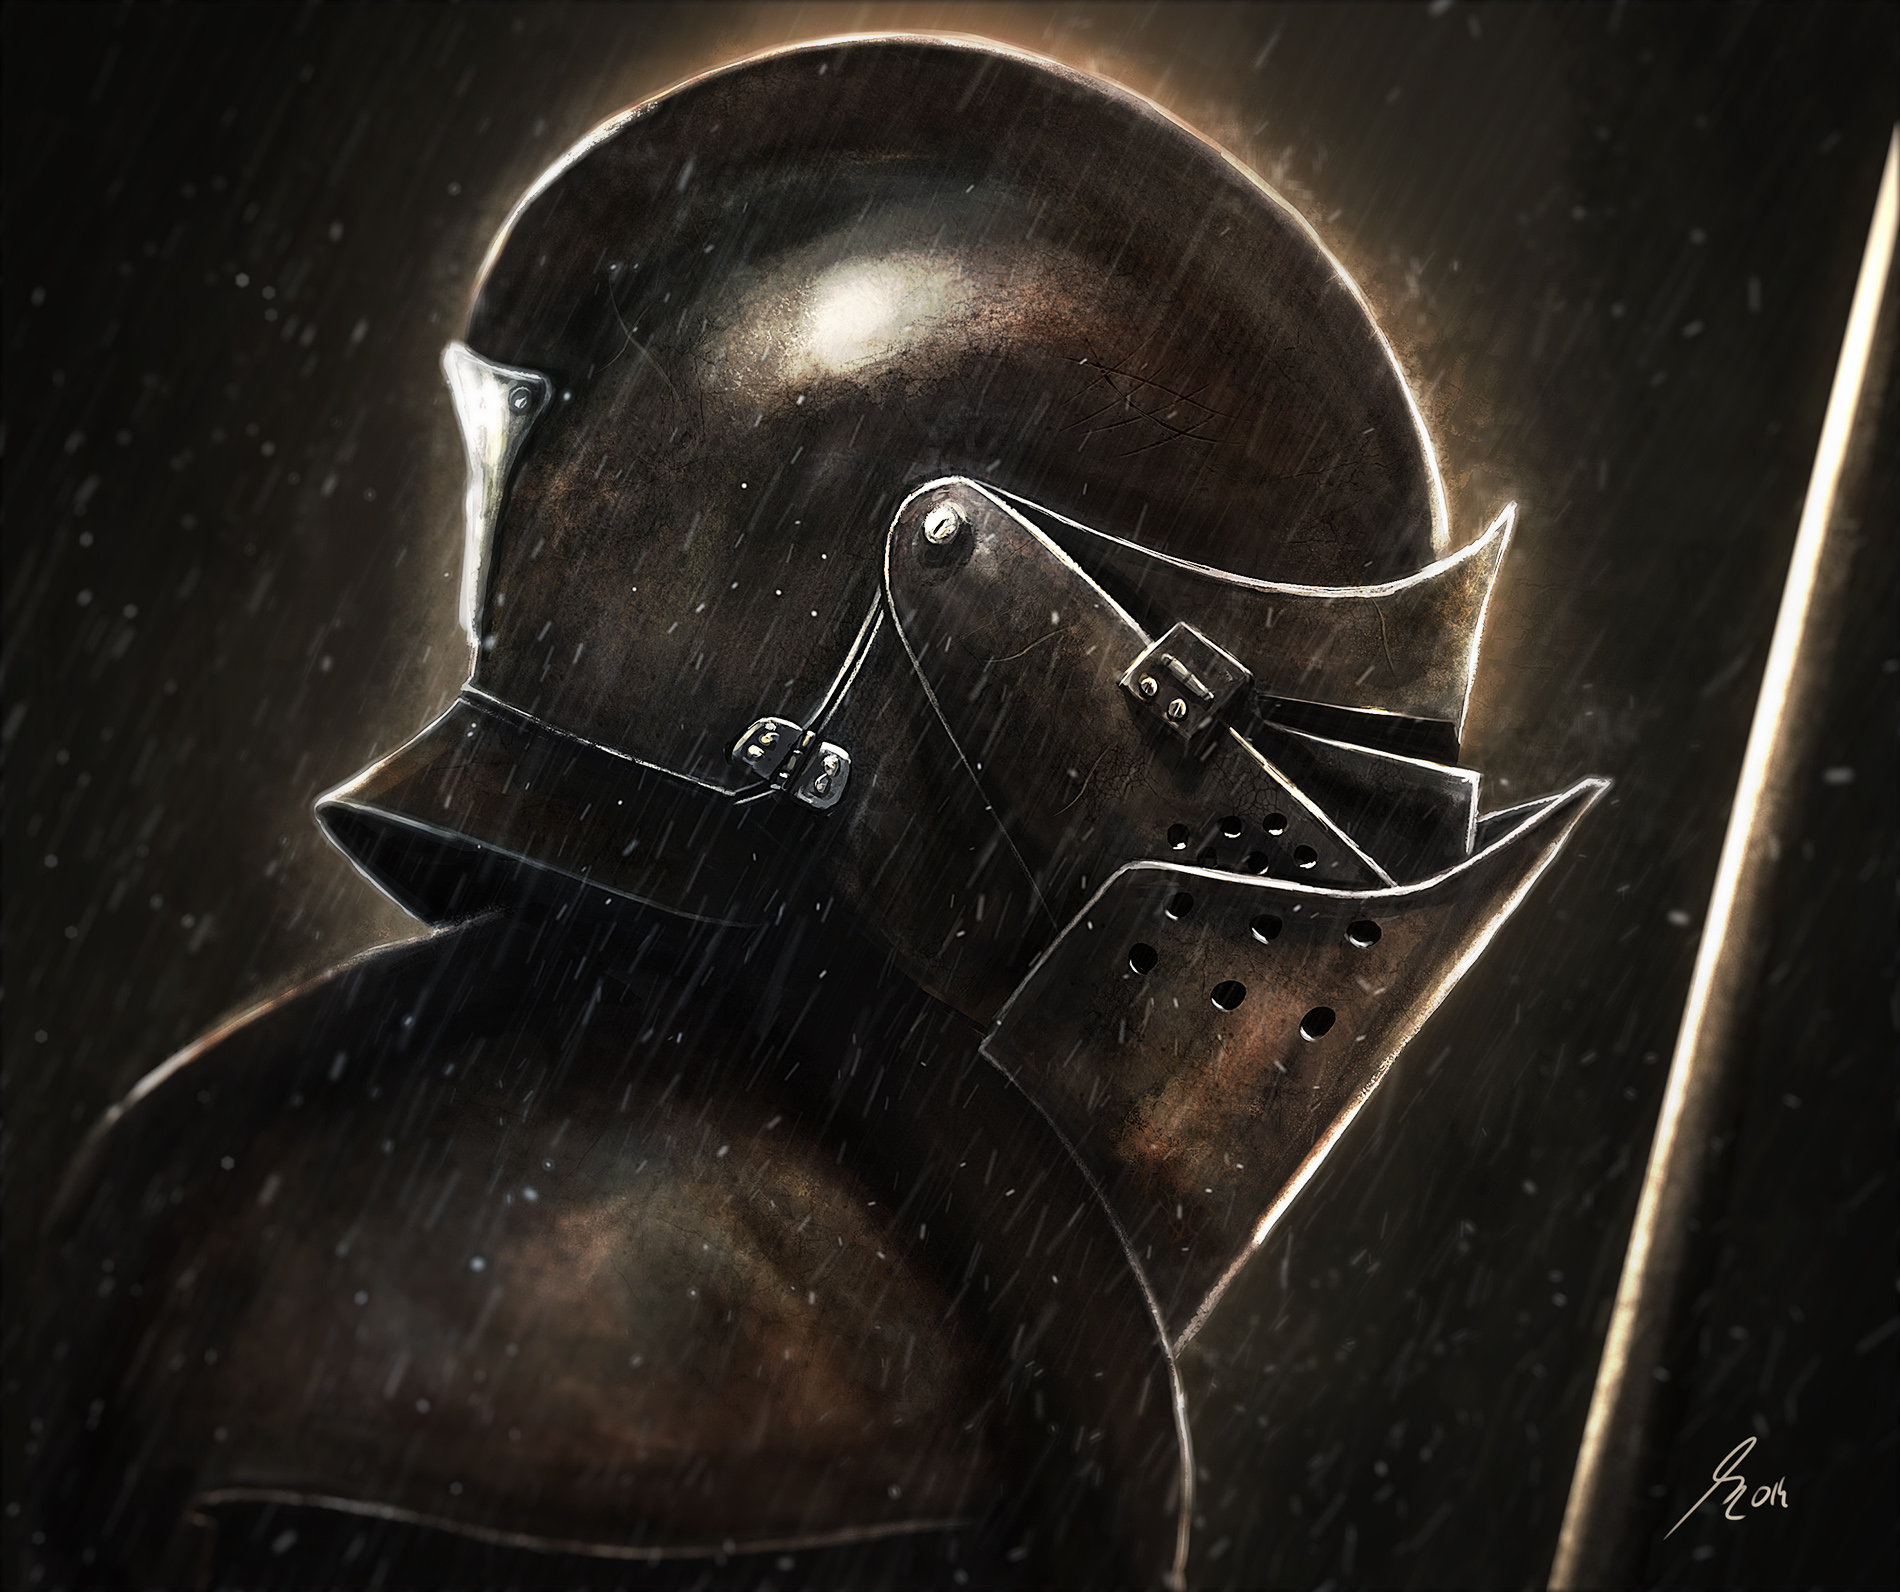 Raistlin majere knight final render